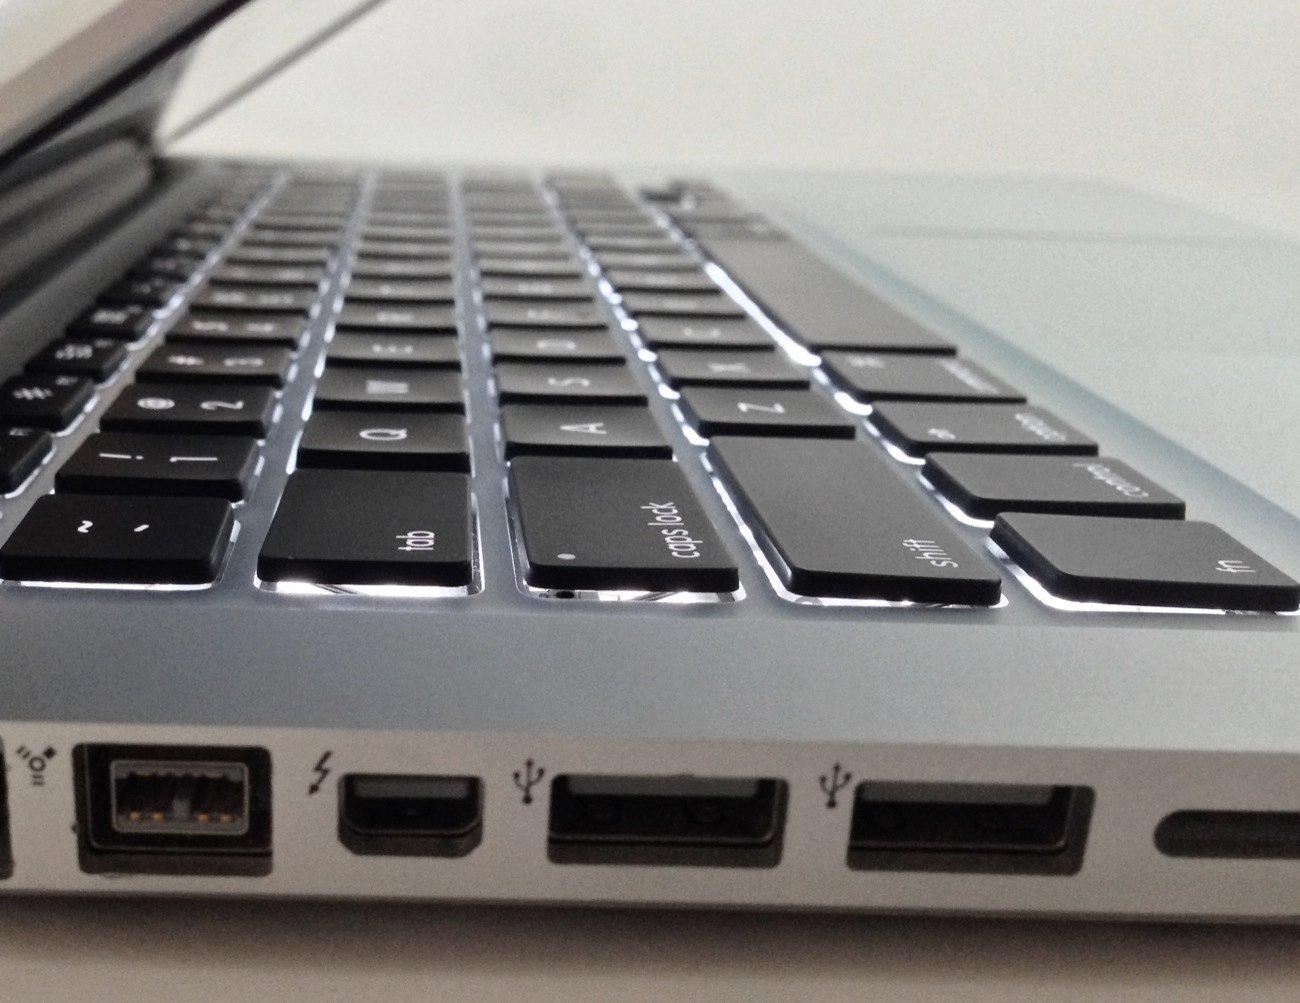 amazon com apple macbook pro mb990ll a 13 3 inch laptop